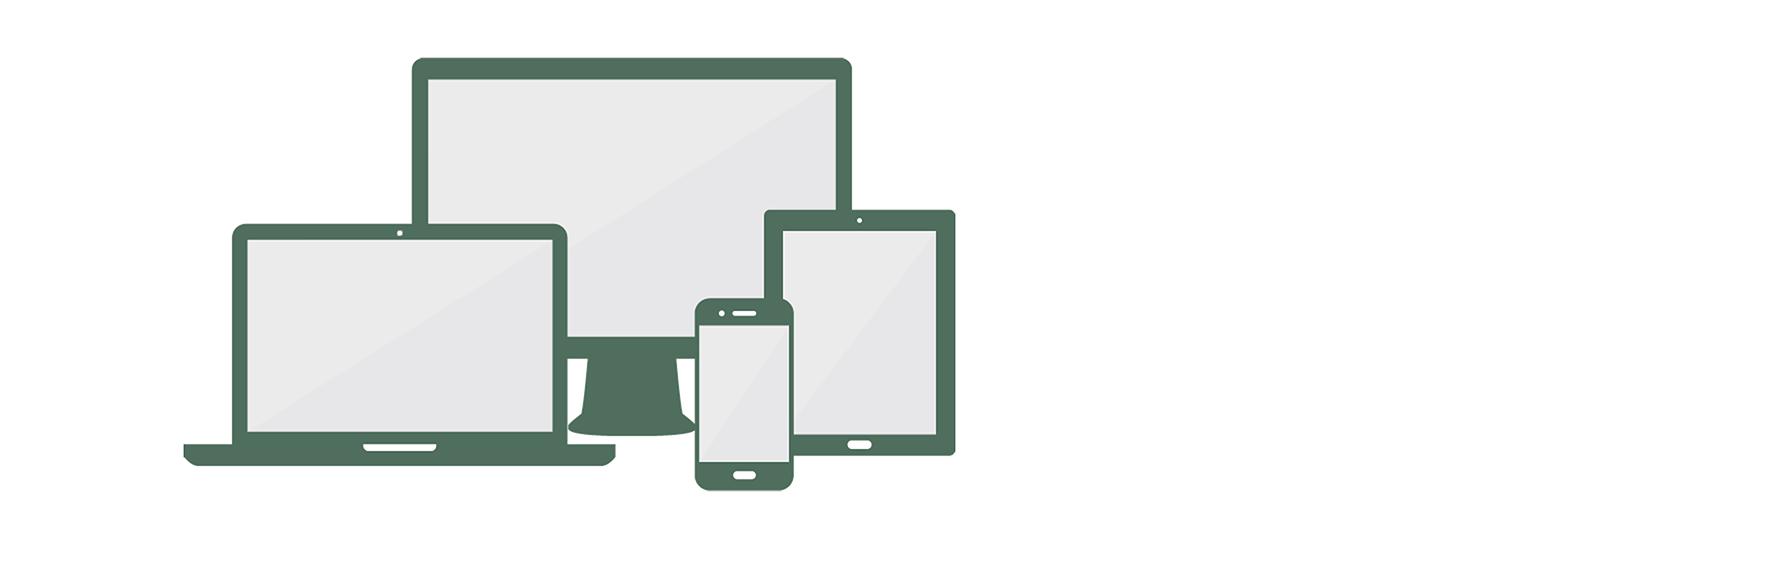 FOS Website Renovation 2015